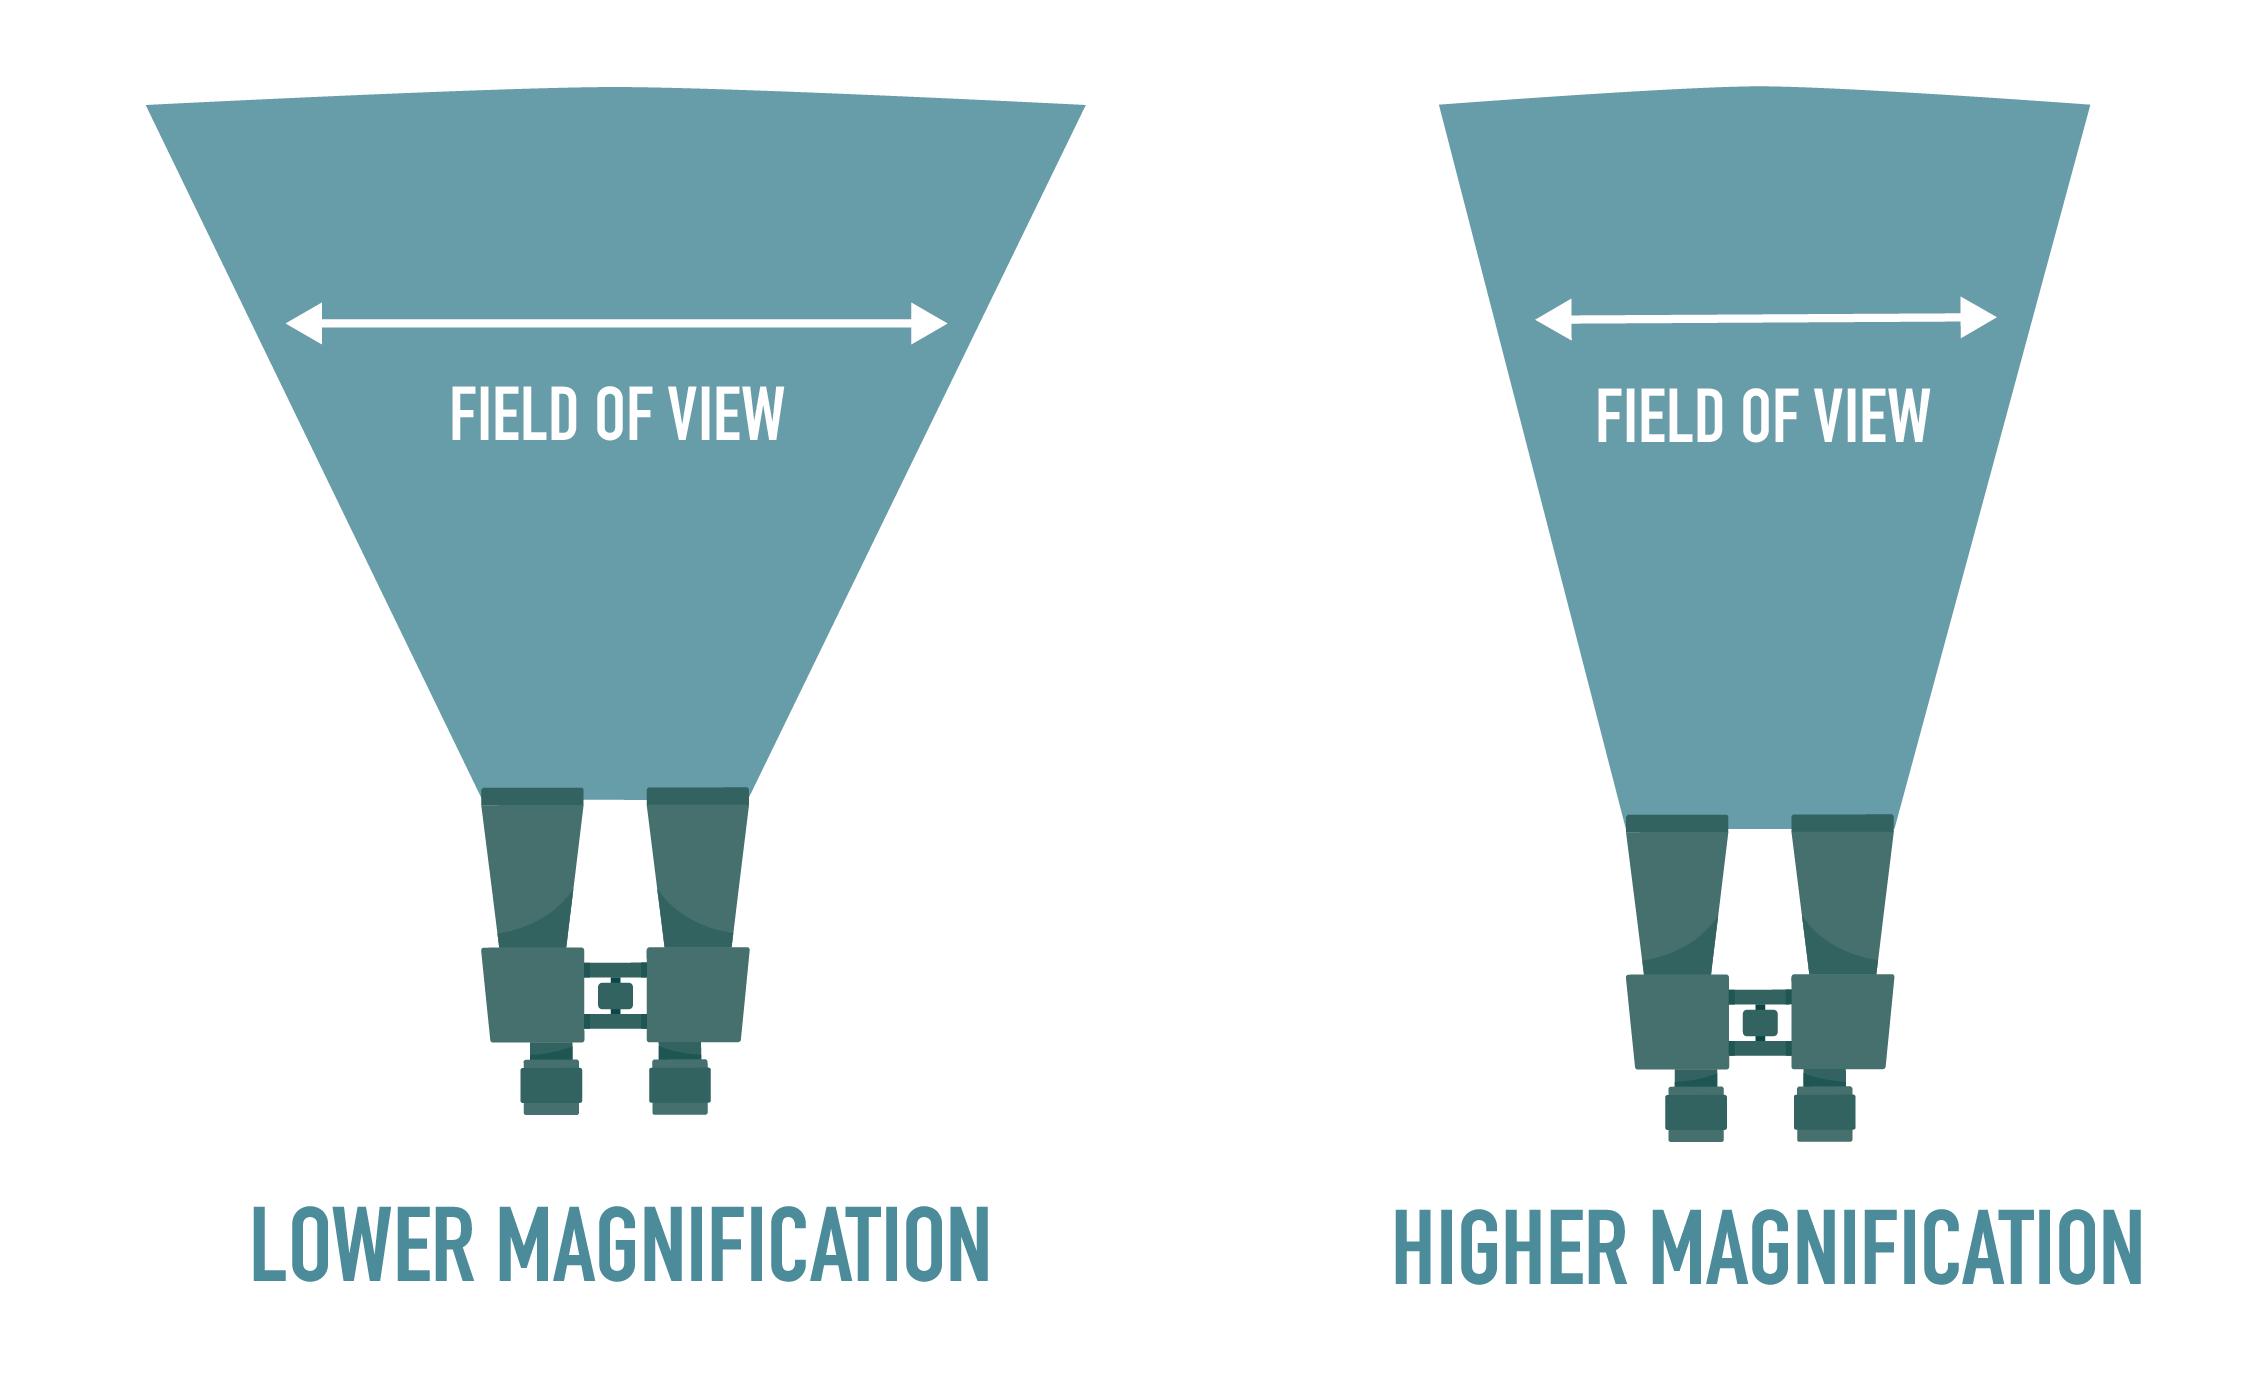 Binoculars-field-of-view